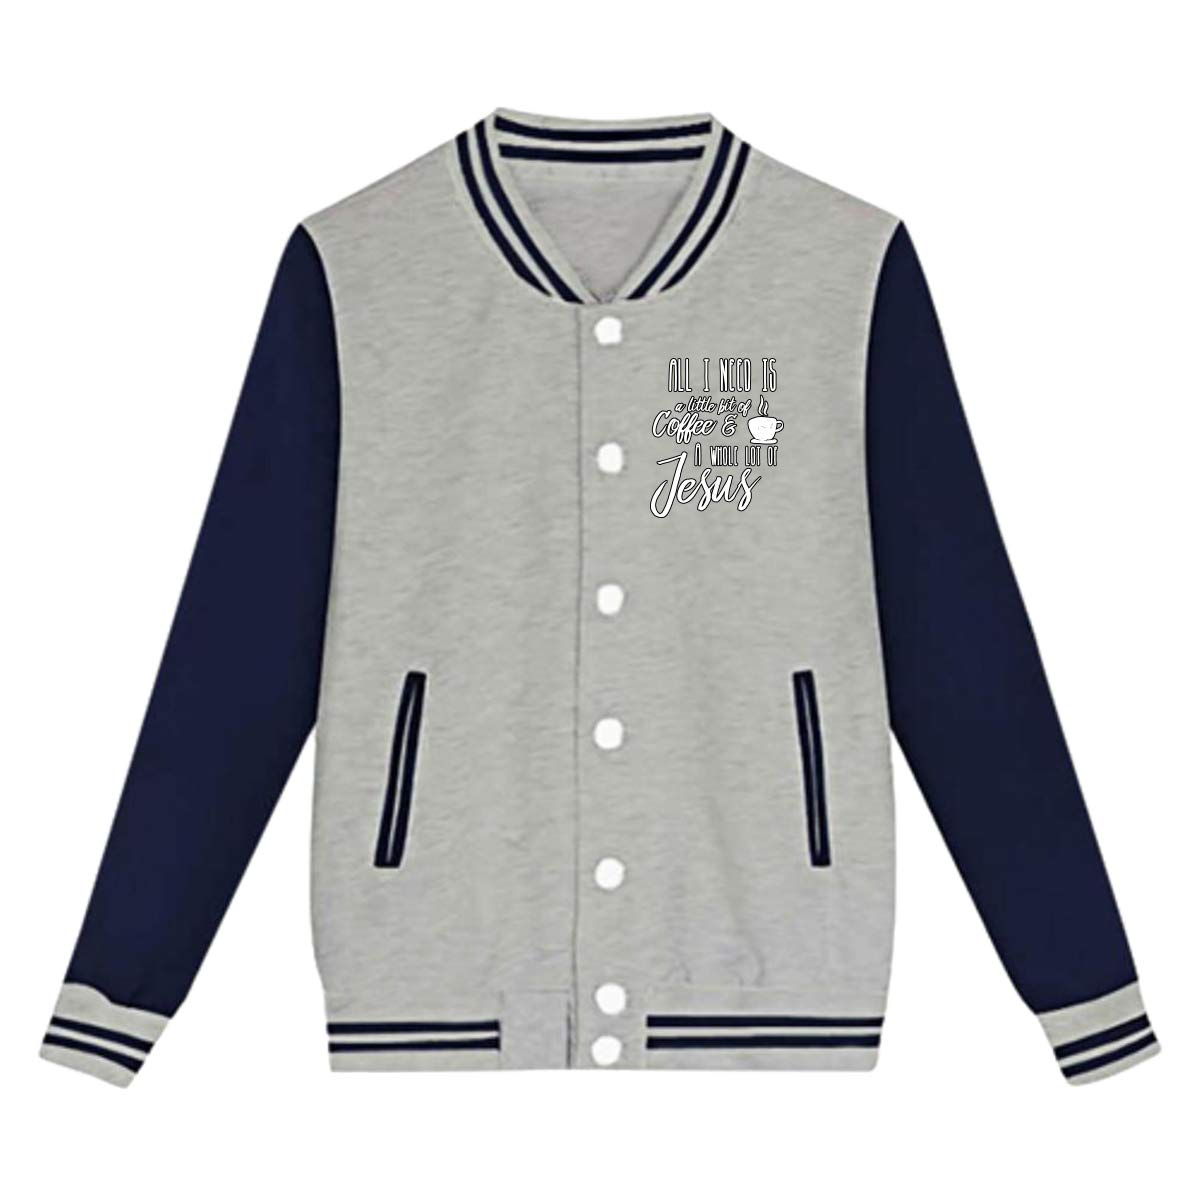 Tina TN All I Need is Little Bit of Coffee and Whole Lot of Jesus Teens Boys Girl Varsity Baseball Jacket Long Sleeve Sport Baseball Uniform Jacket Coat Sweater Black